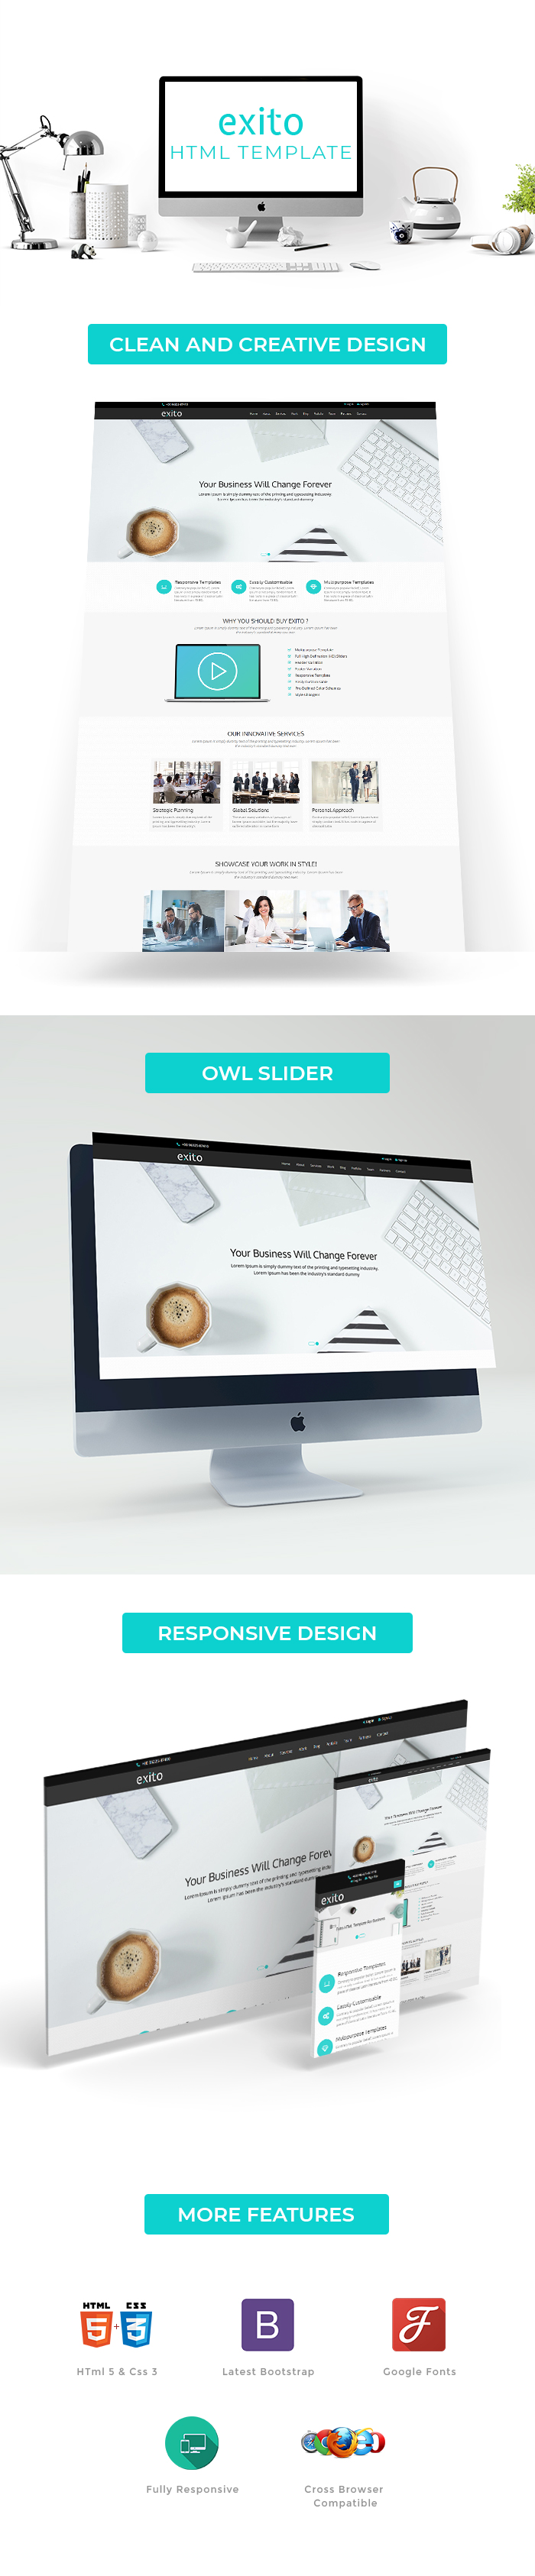 Exito HTML Website Templates